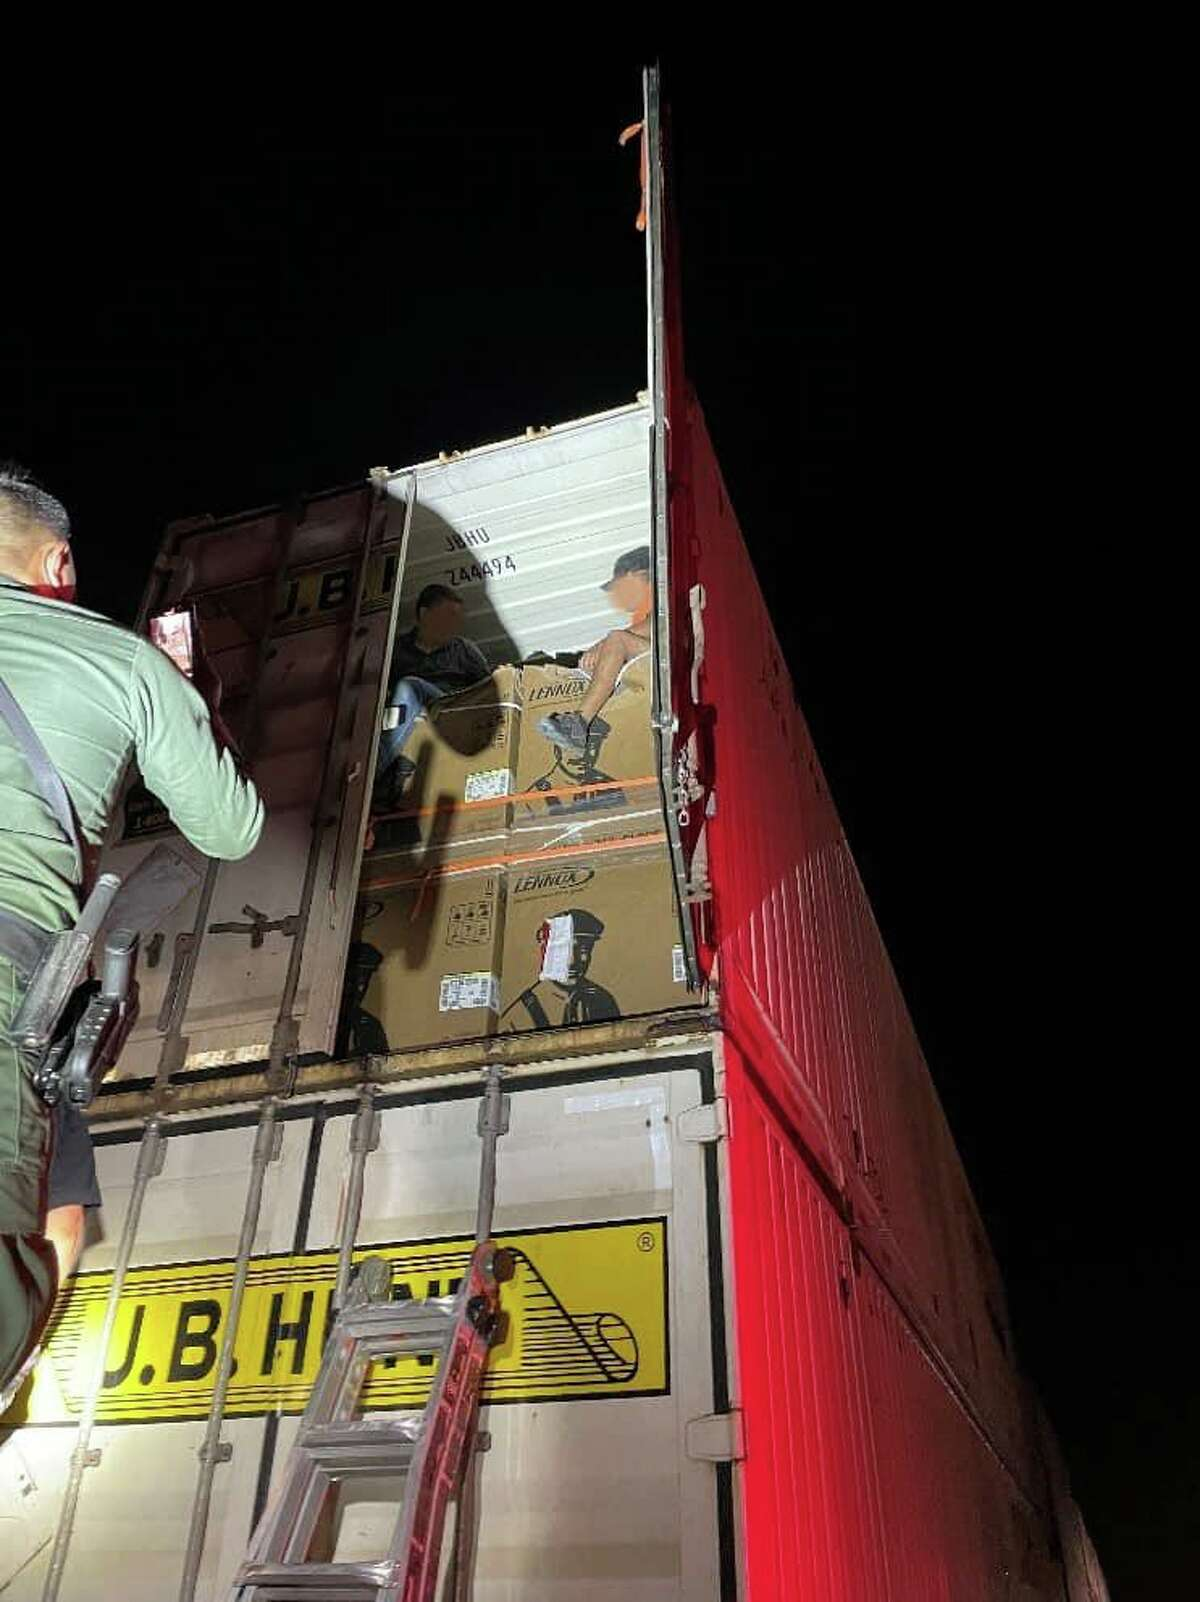 The U.S. Border Patrol announced 20 migrants were found inside a train near Hebbronville on Monday morning.